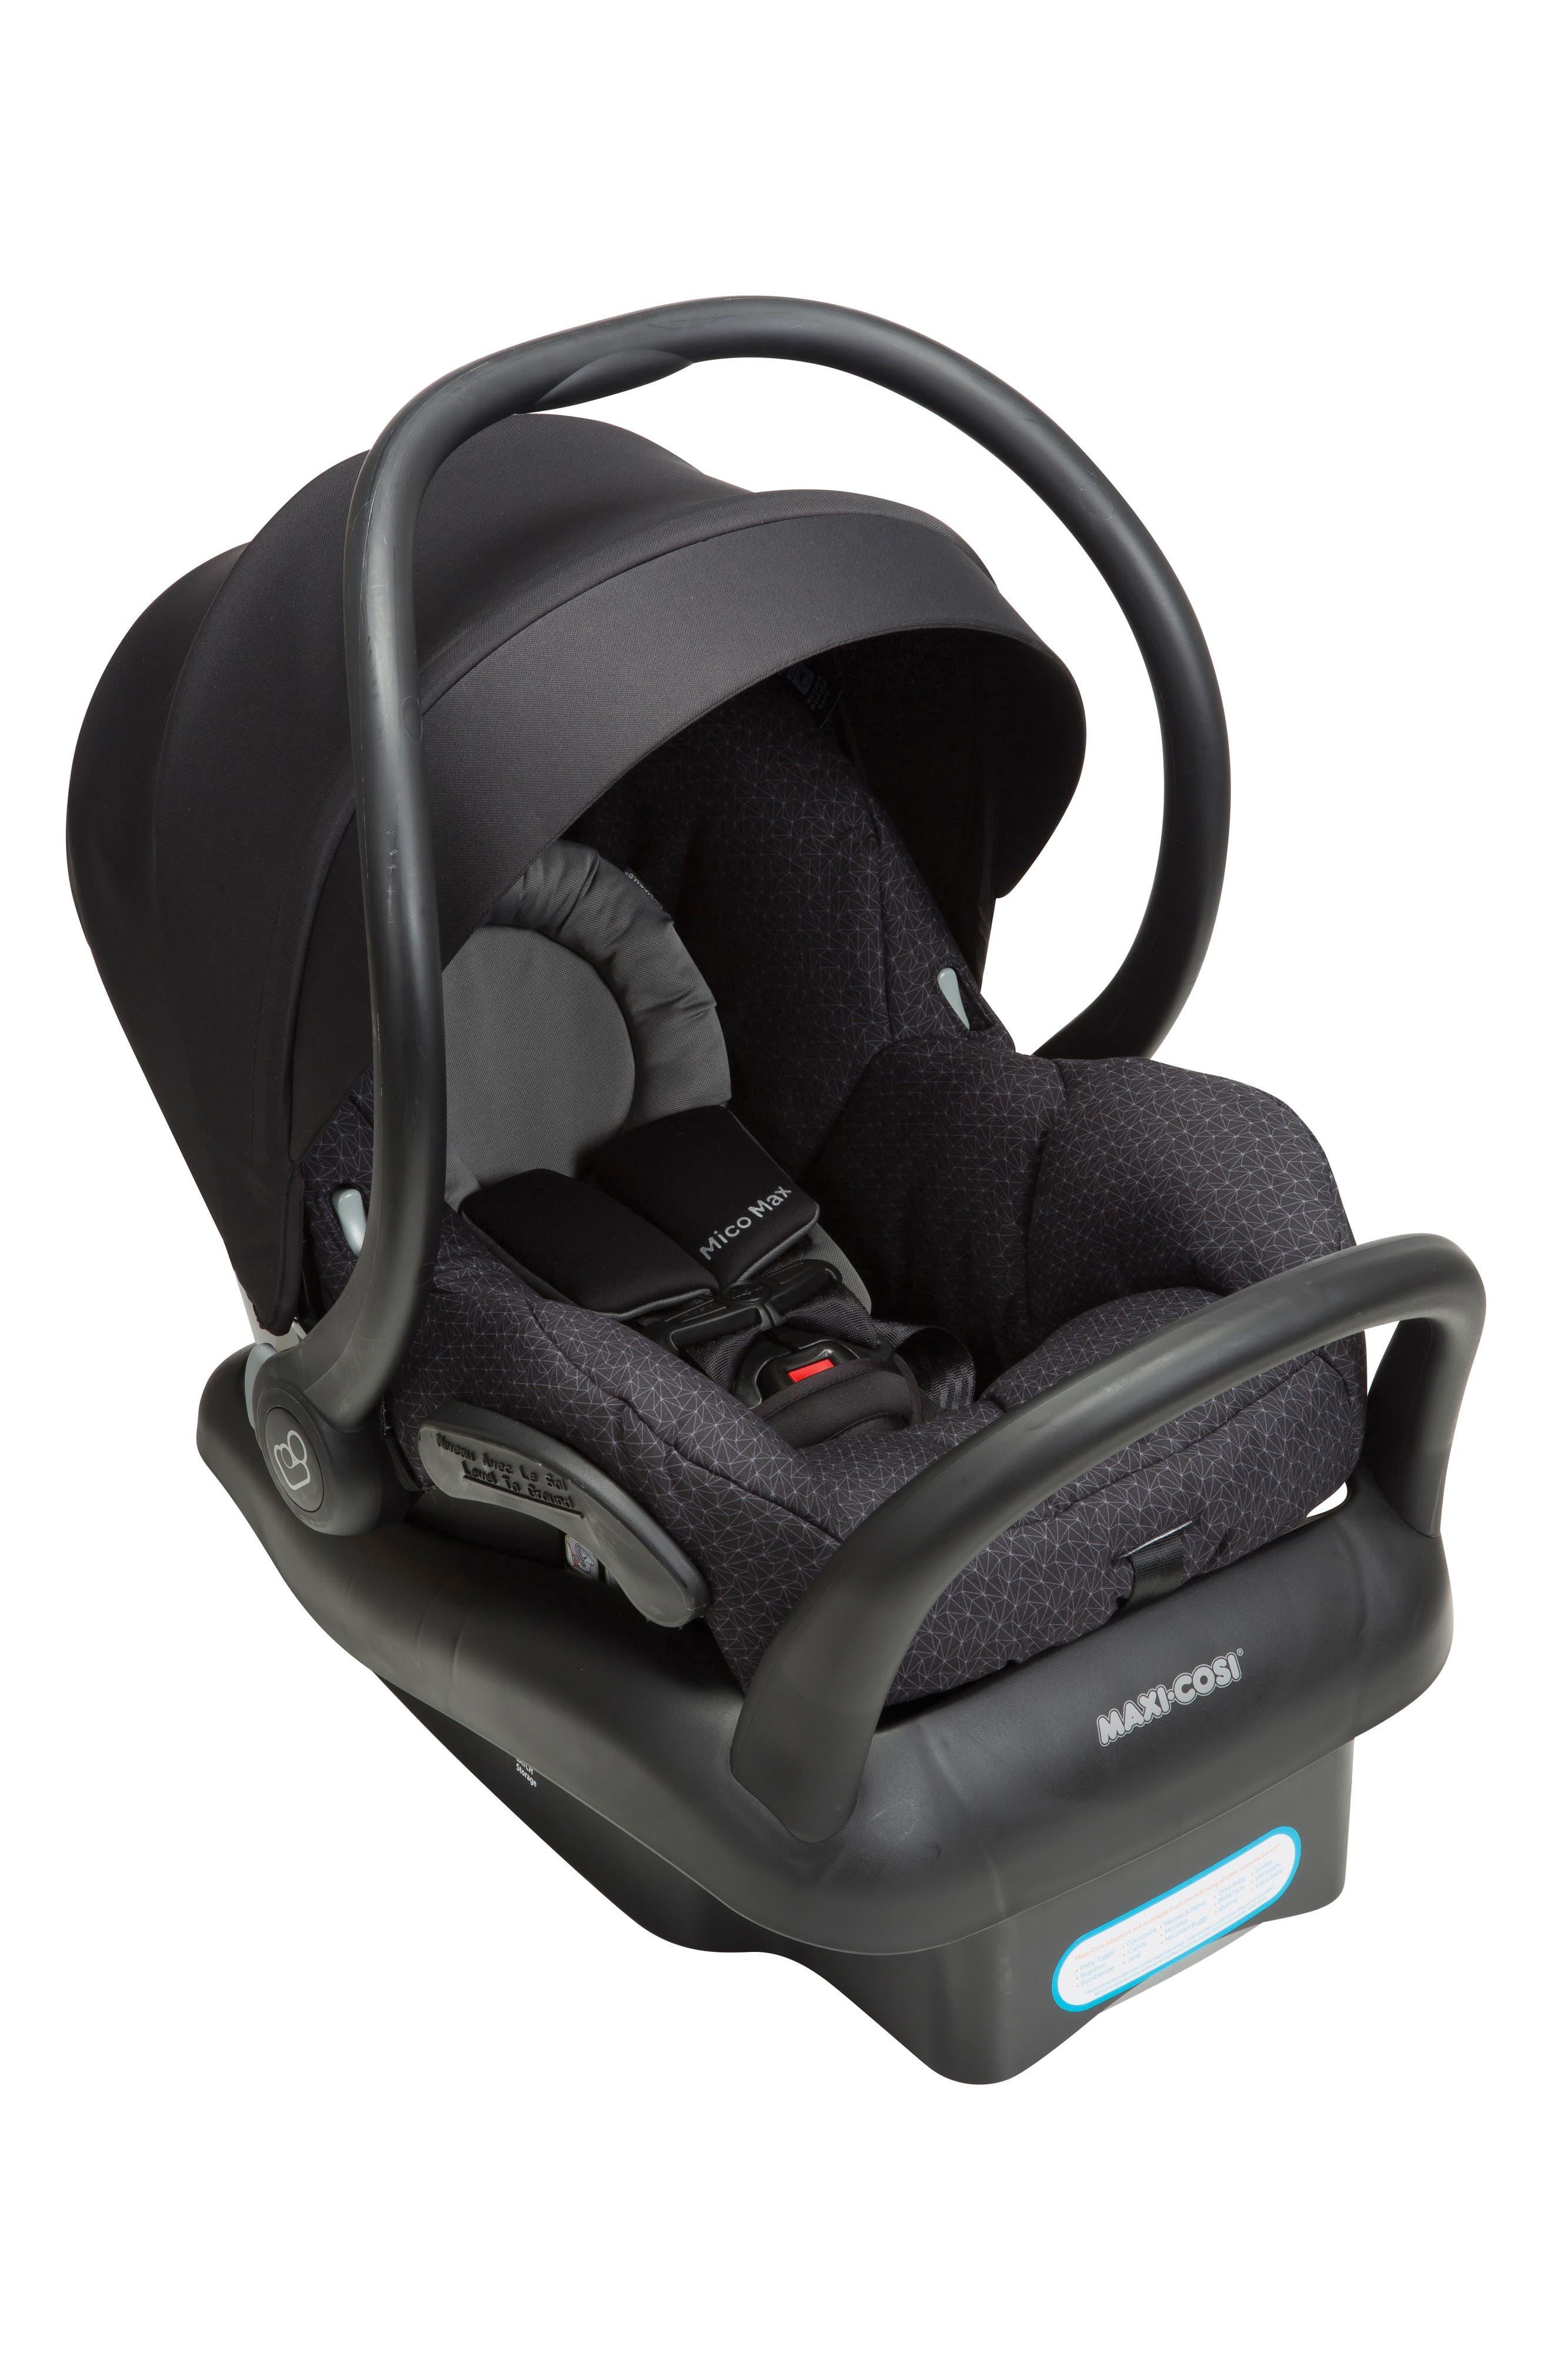 Maxi-Cosi® Mico Max 30 Infant Car Seat (Nordstrom Exclusive)